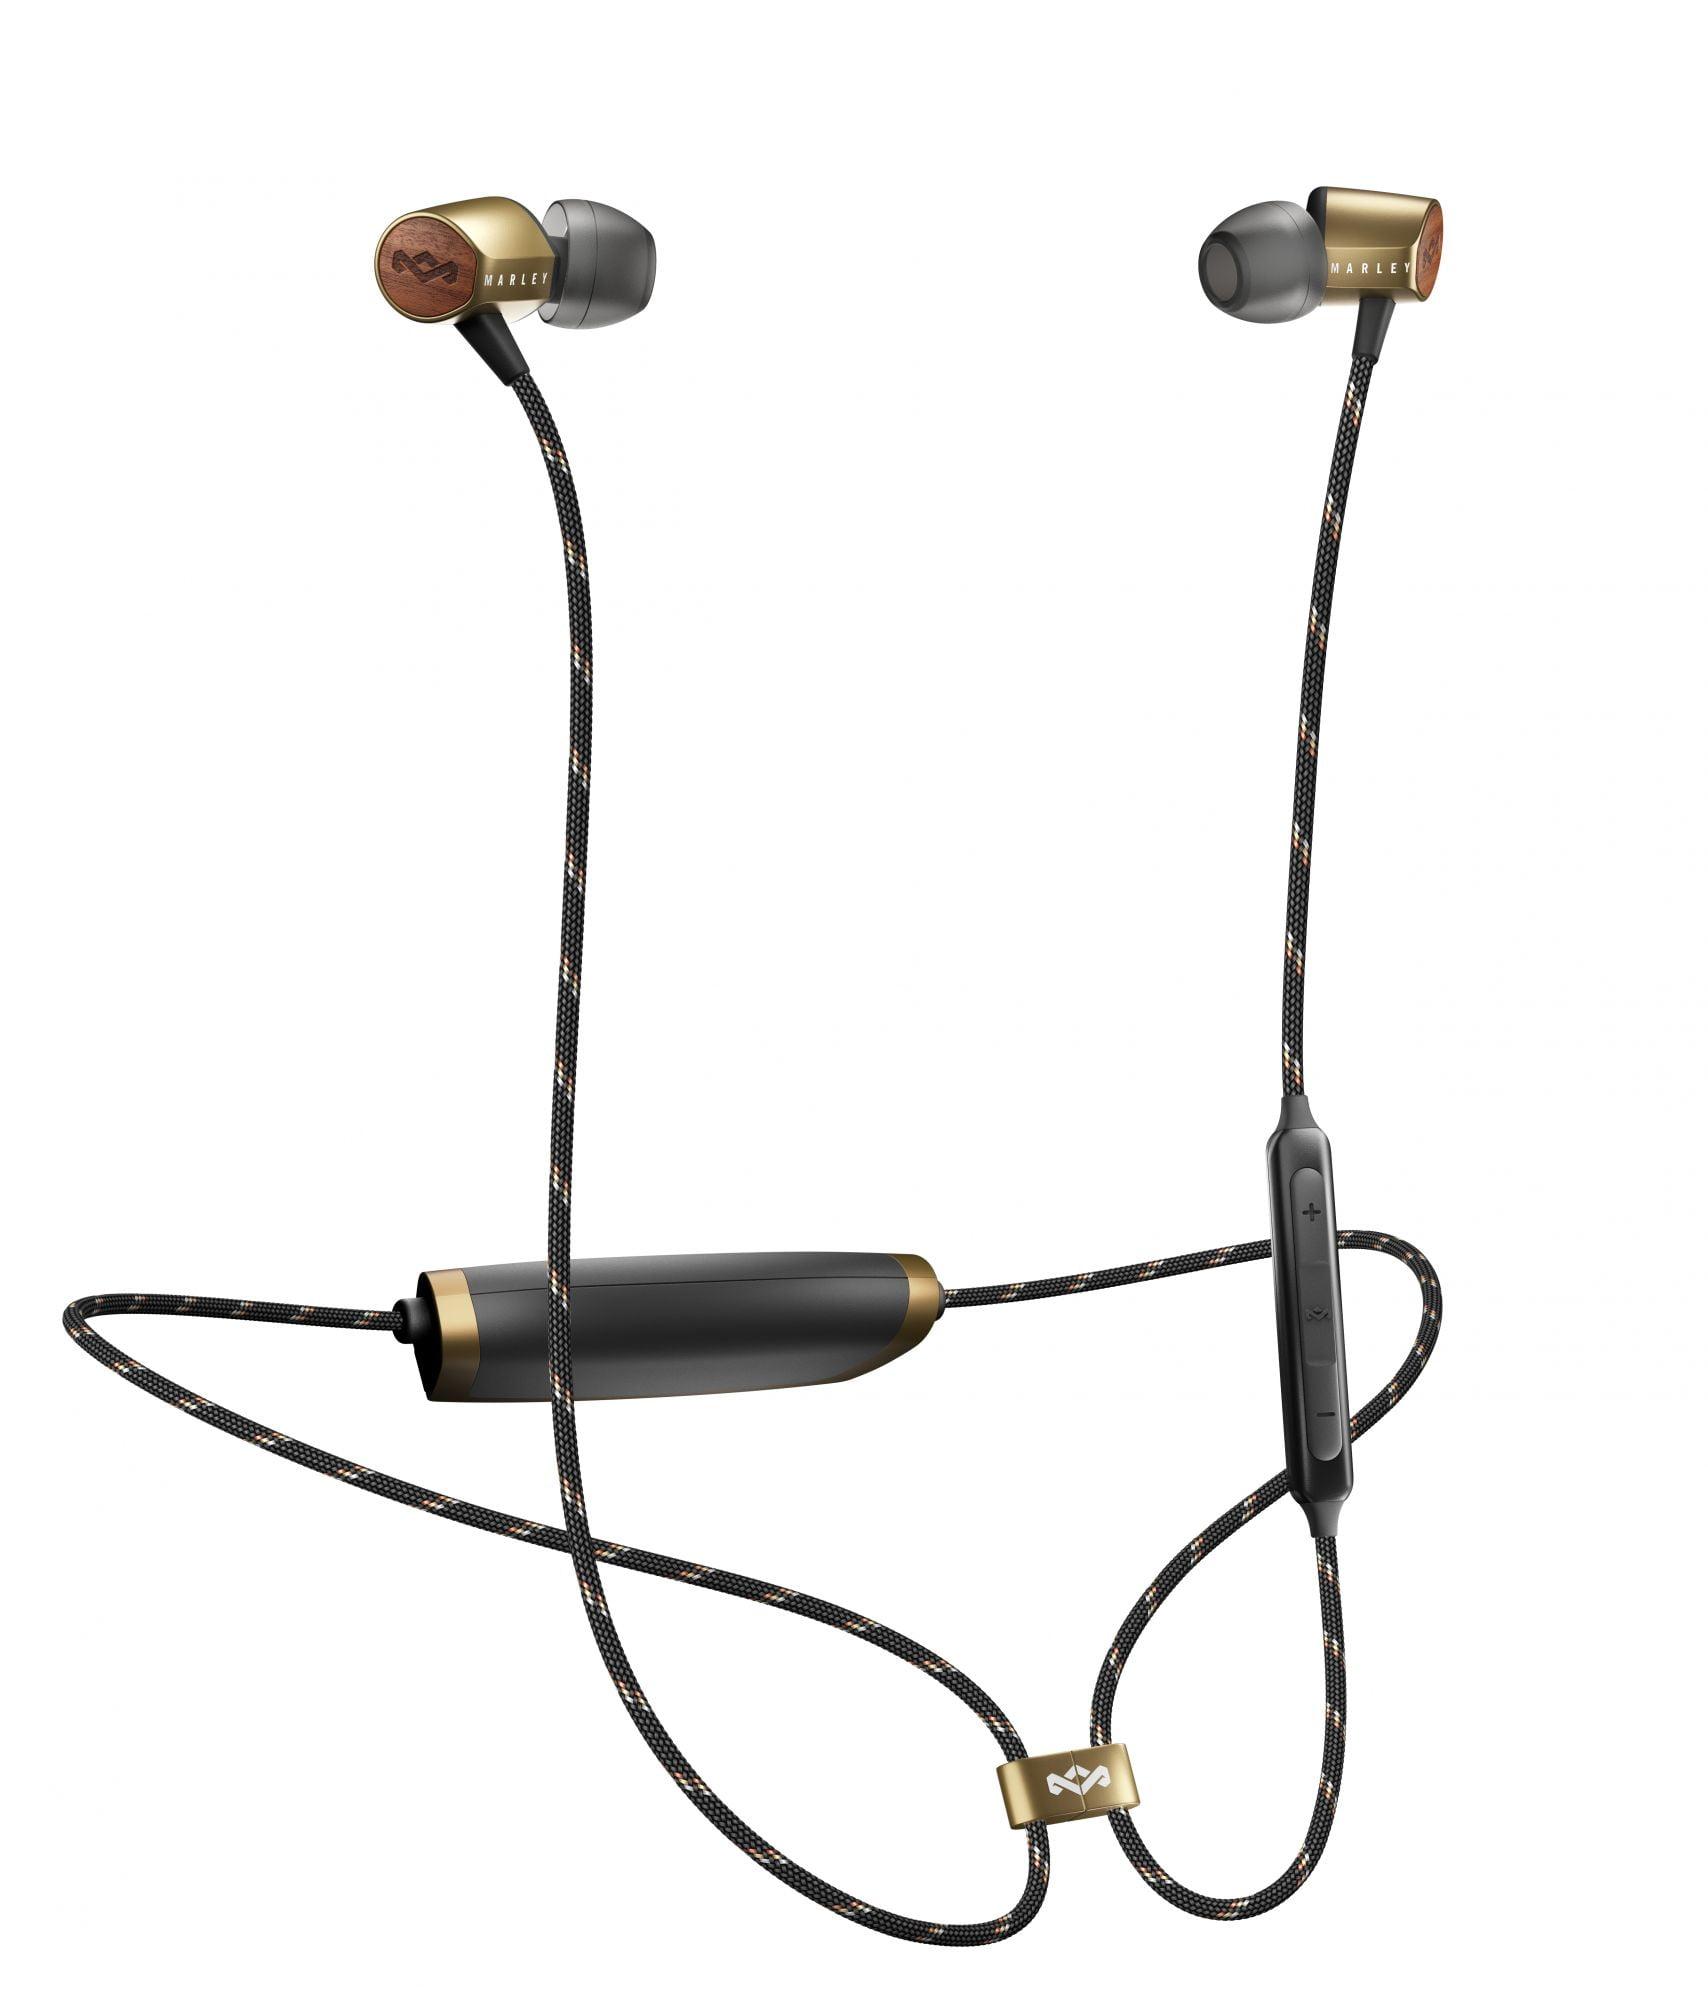 House of Marley Uplift Bluetooth ušesne slušalke - medenina barve